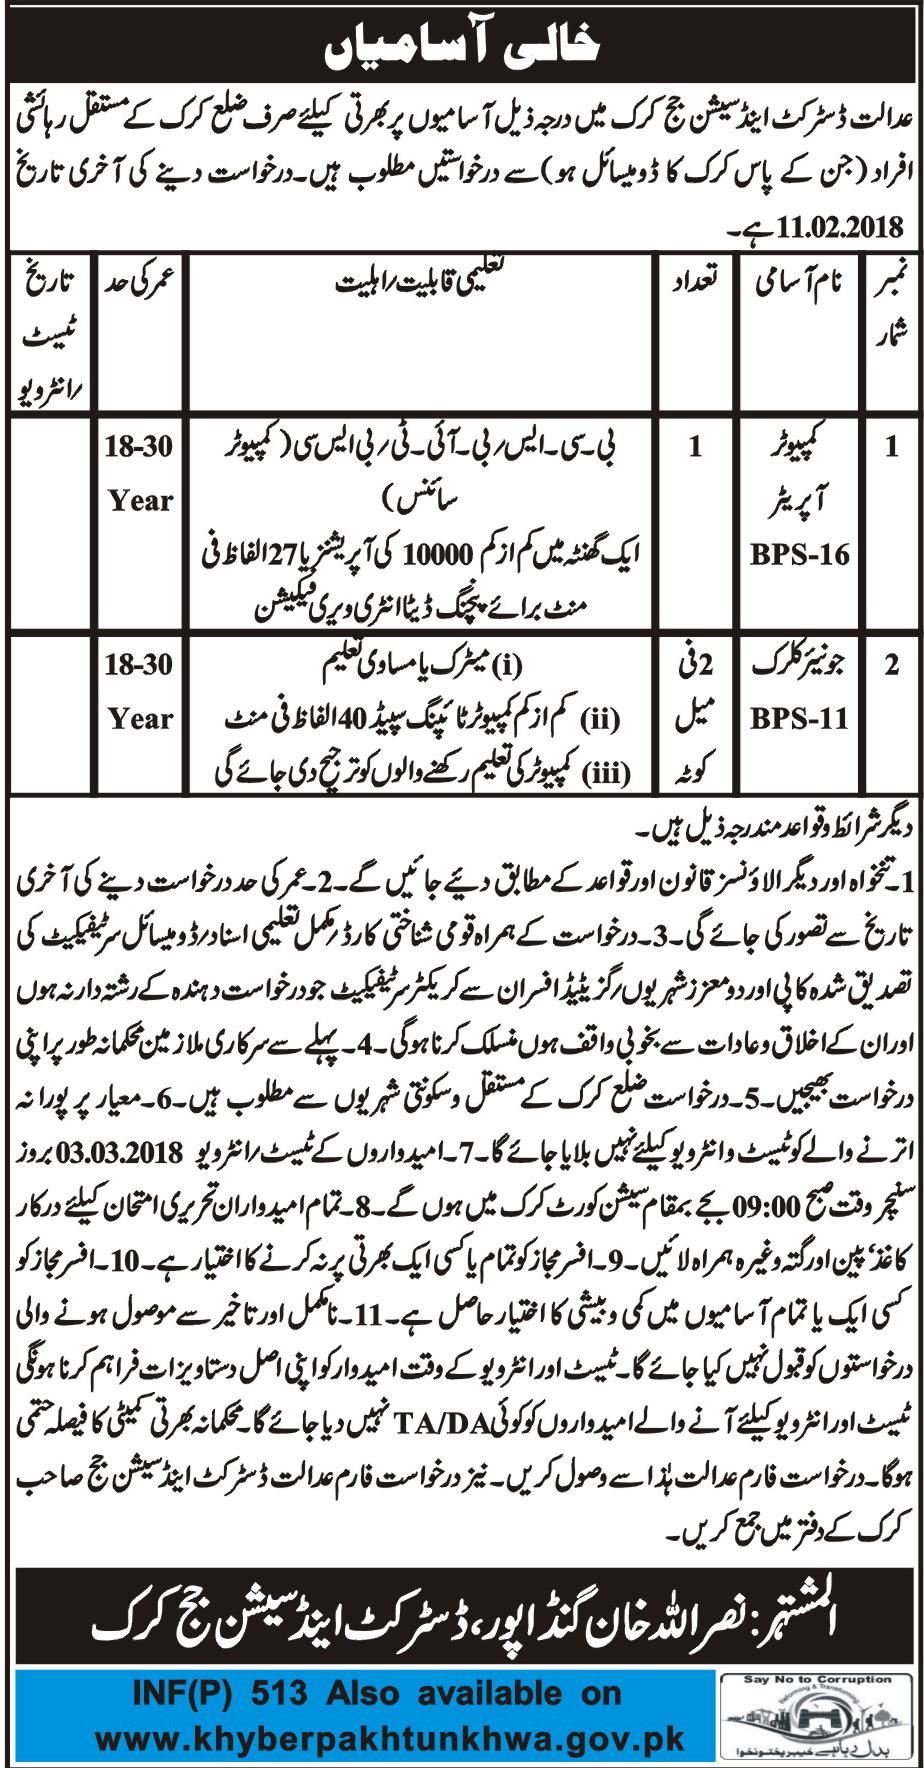 Karak District and Session Judge 03 jobs 31 January 2018, Daily Mashriq Newspaper